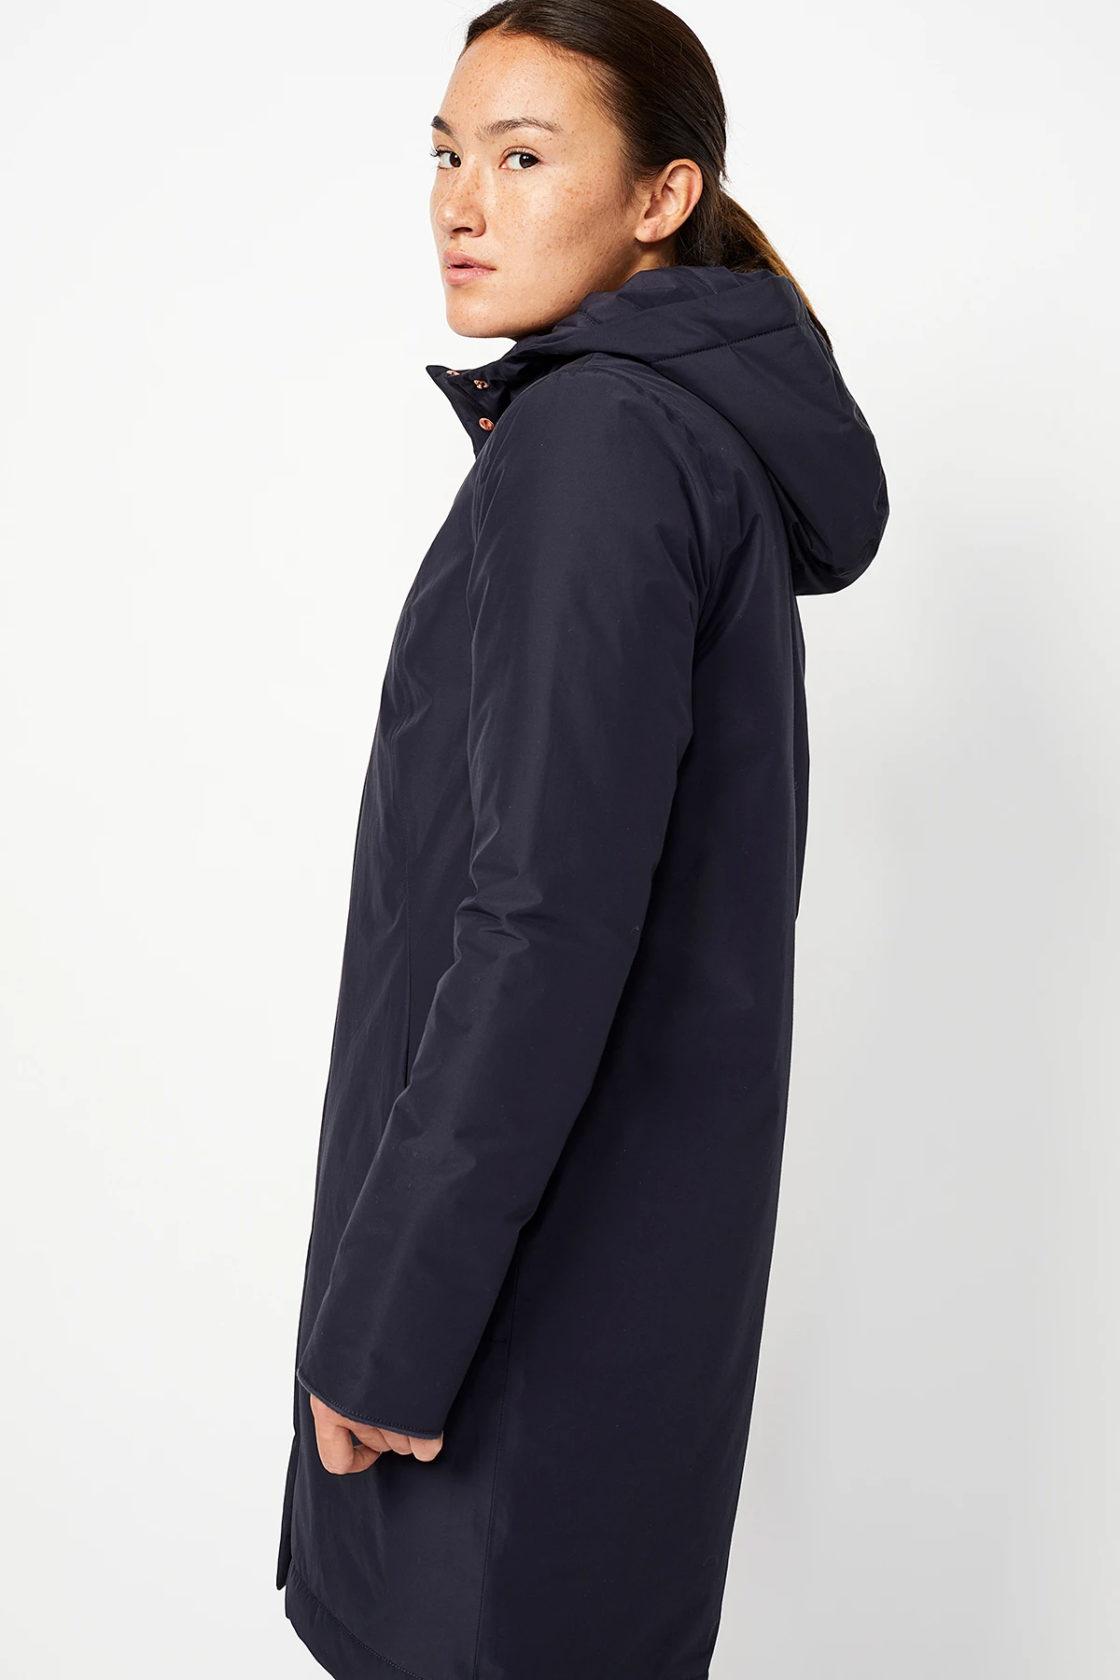 Roberta Organic Fashion Langerchen Coat Ariza Navy 3